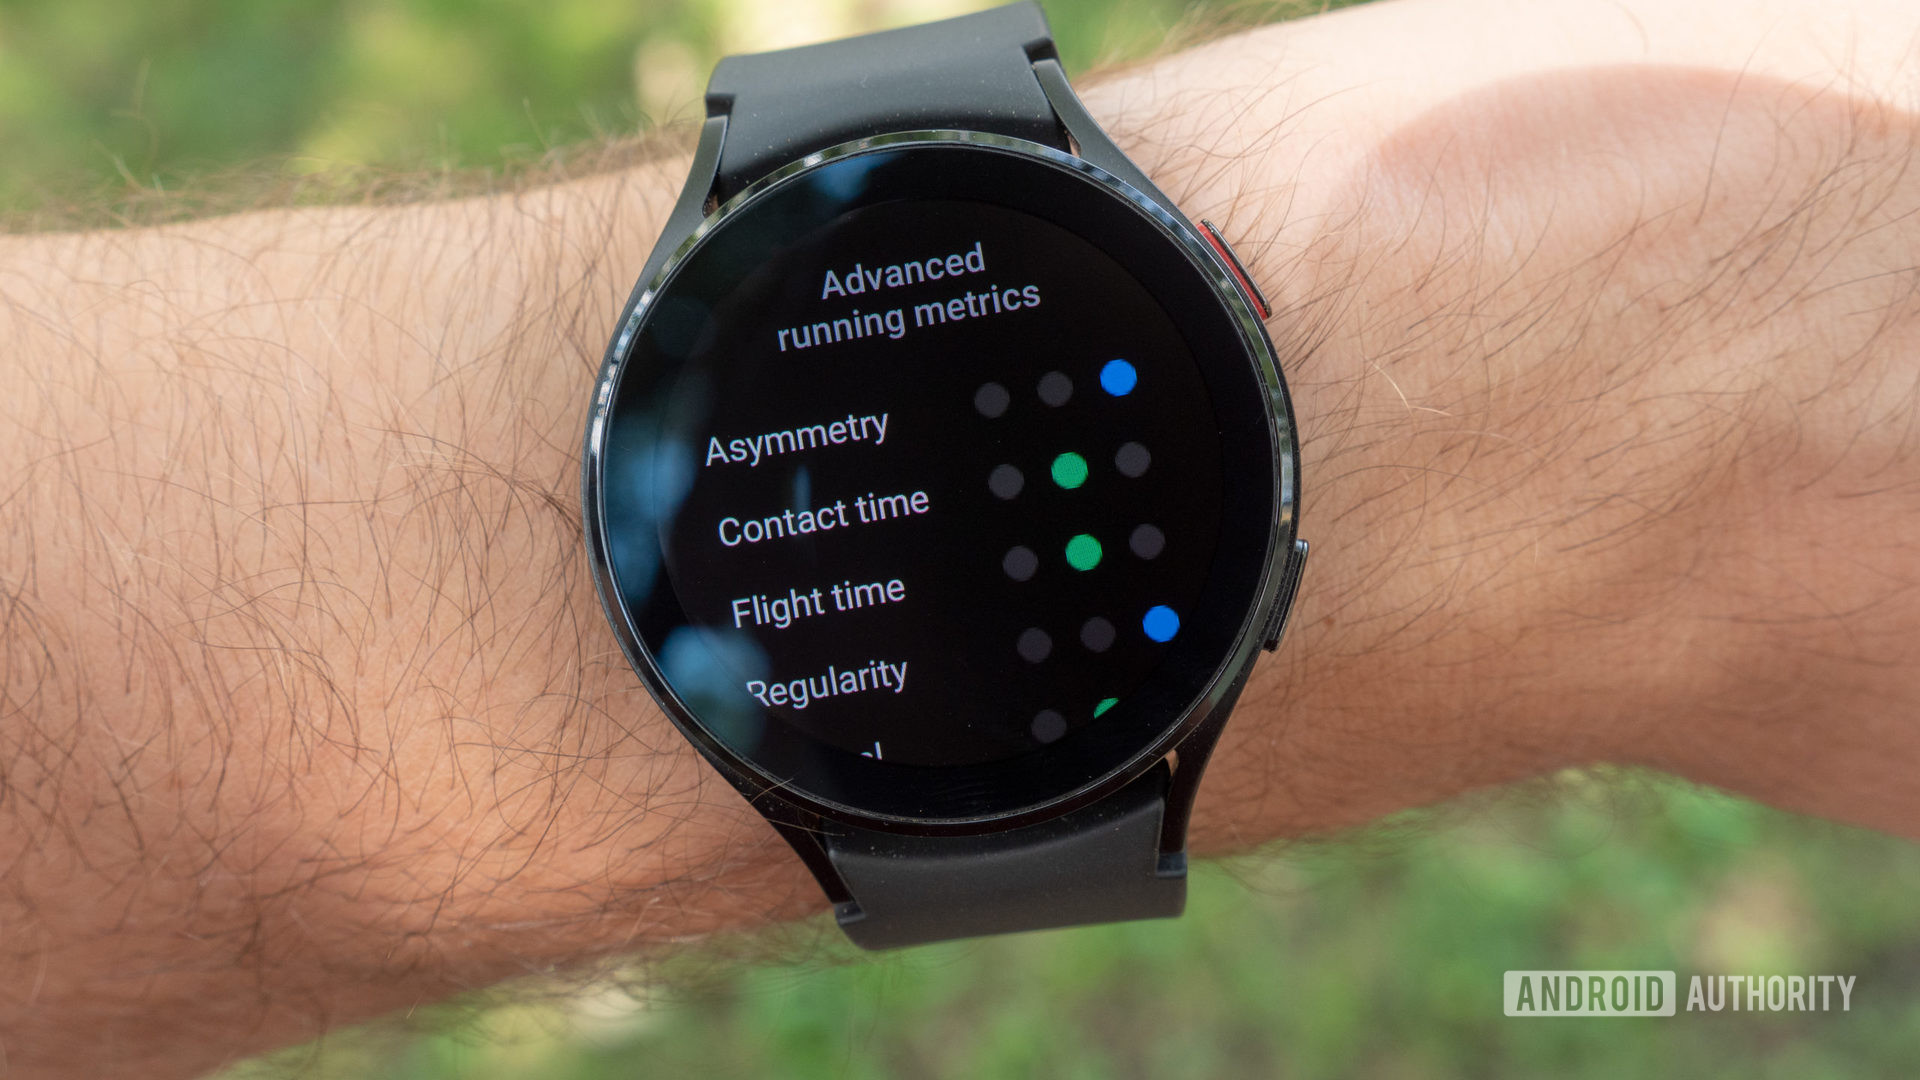 The Samsung Galaxy Watch 4 on a wrist showing advanced running metrics.